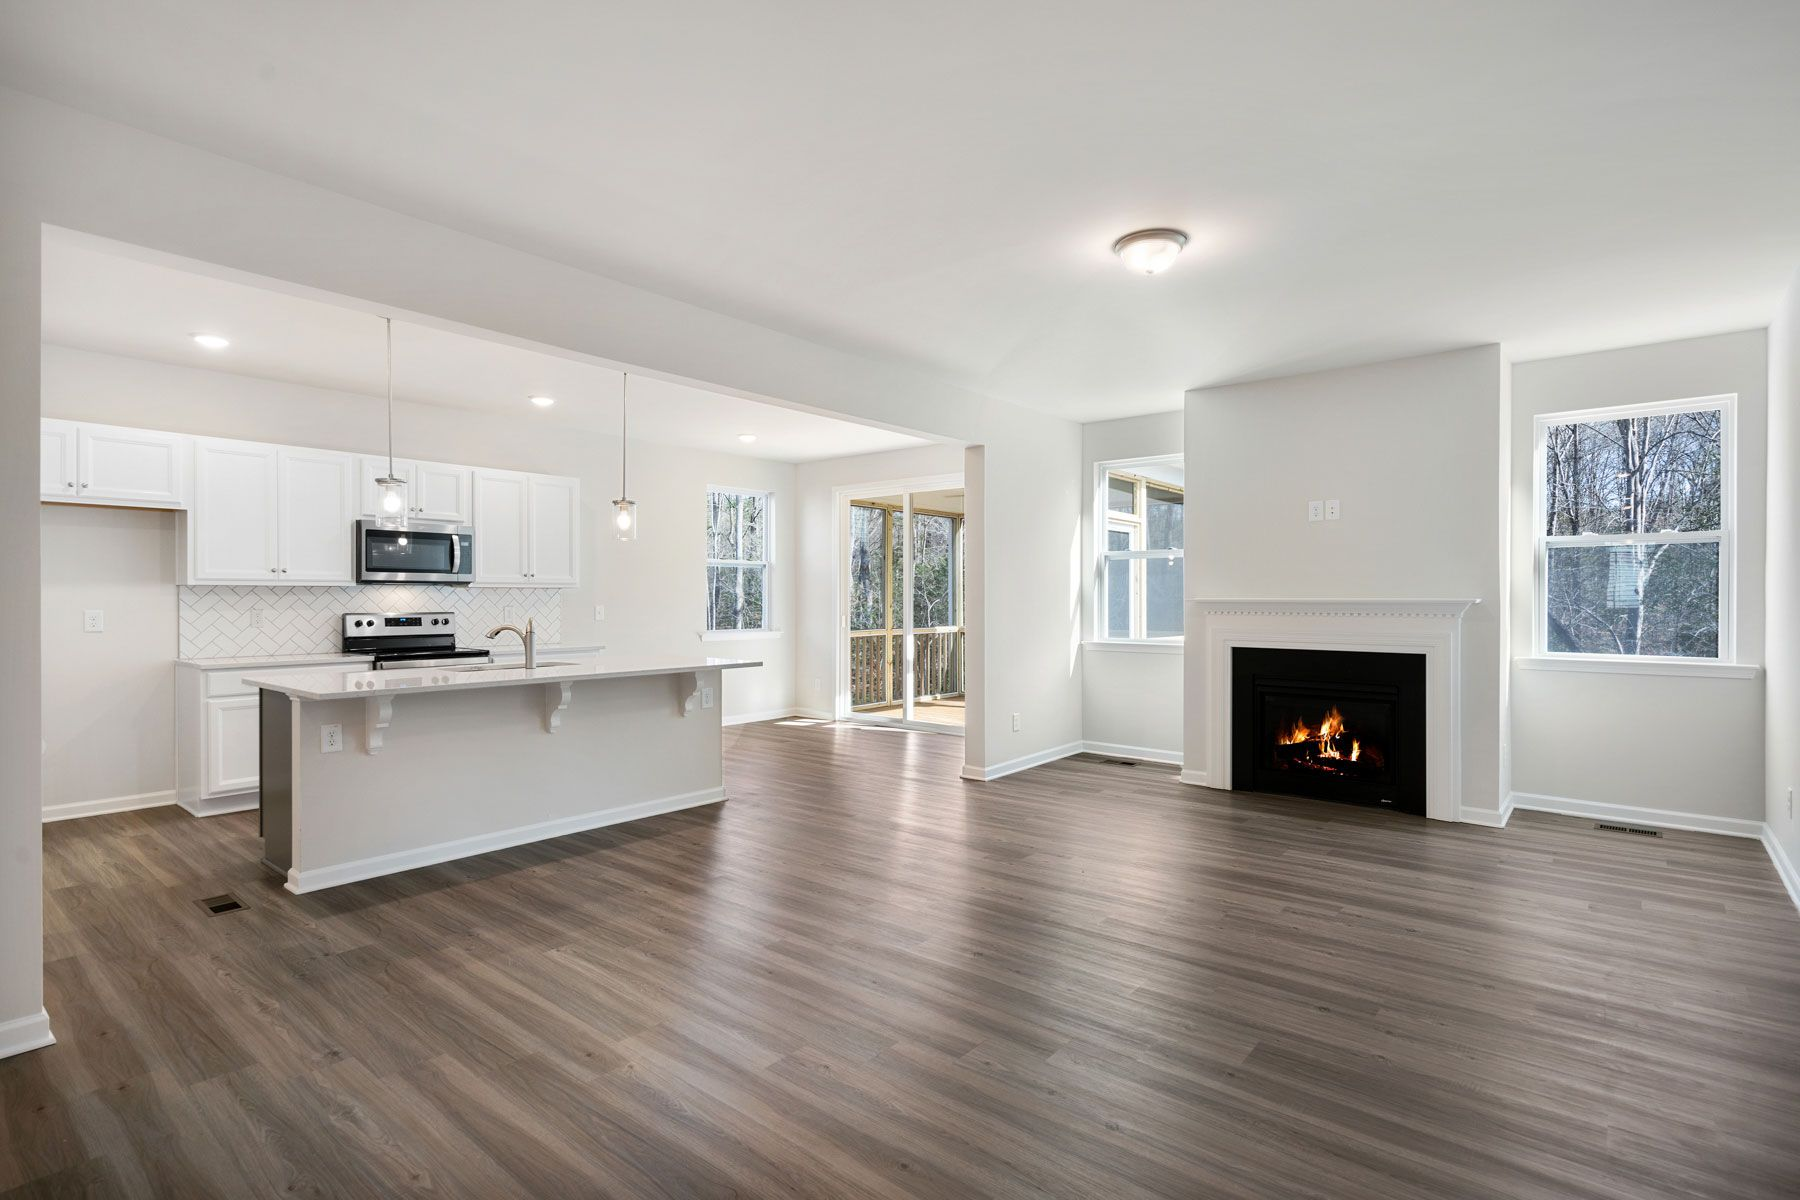 Interior:*Photo representation of the Nolan floorplan